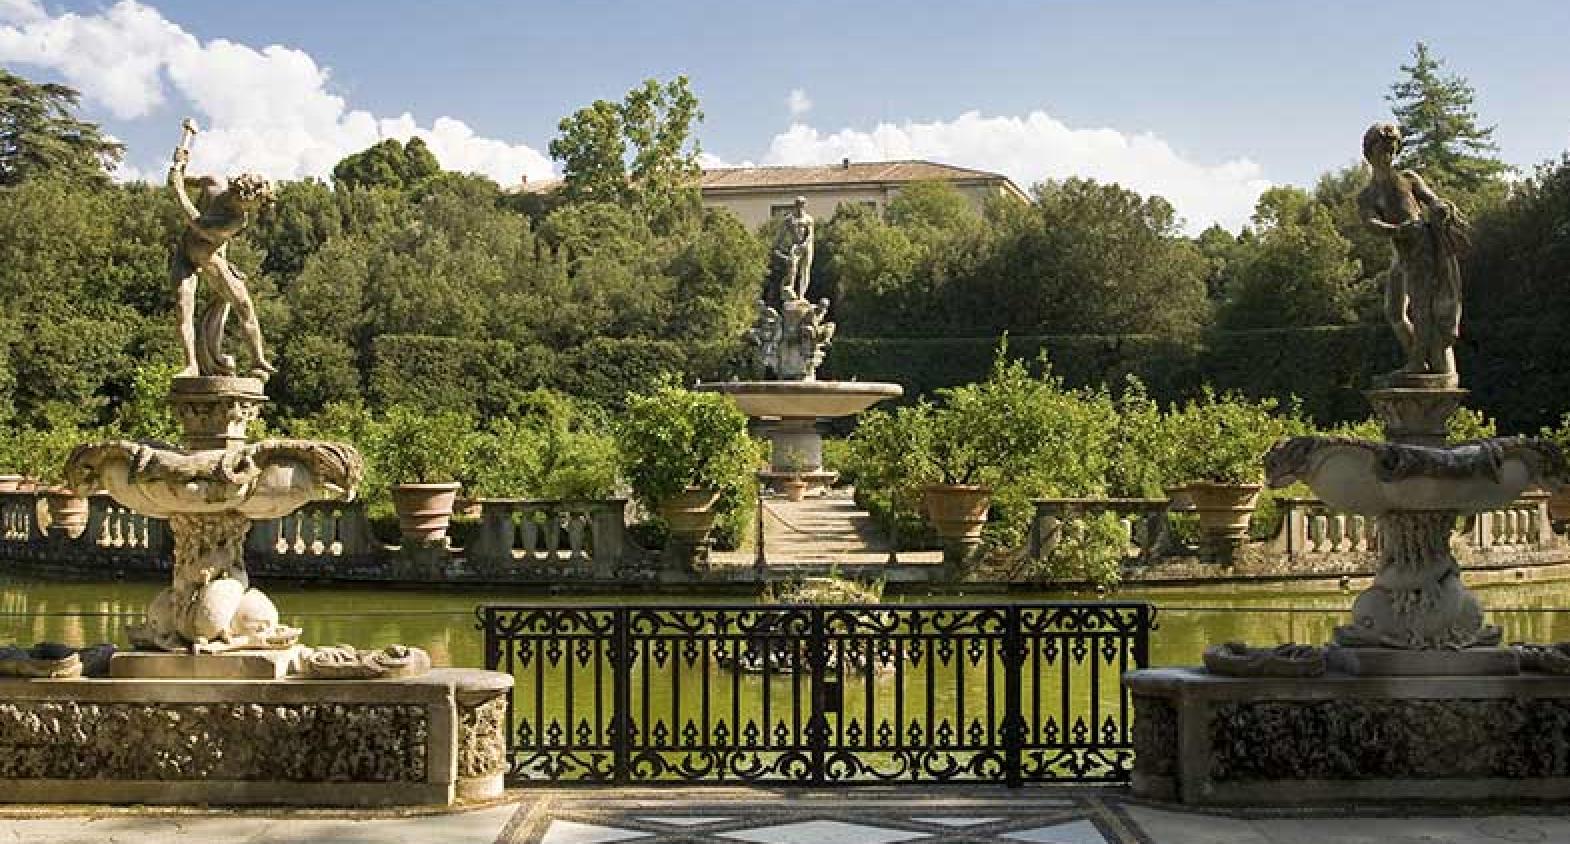 Gucci vai doar dois milhões para recuperar os jardins Boboli